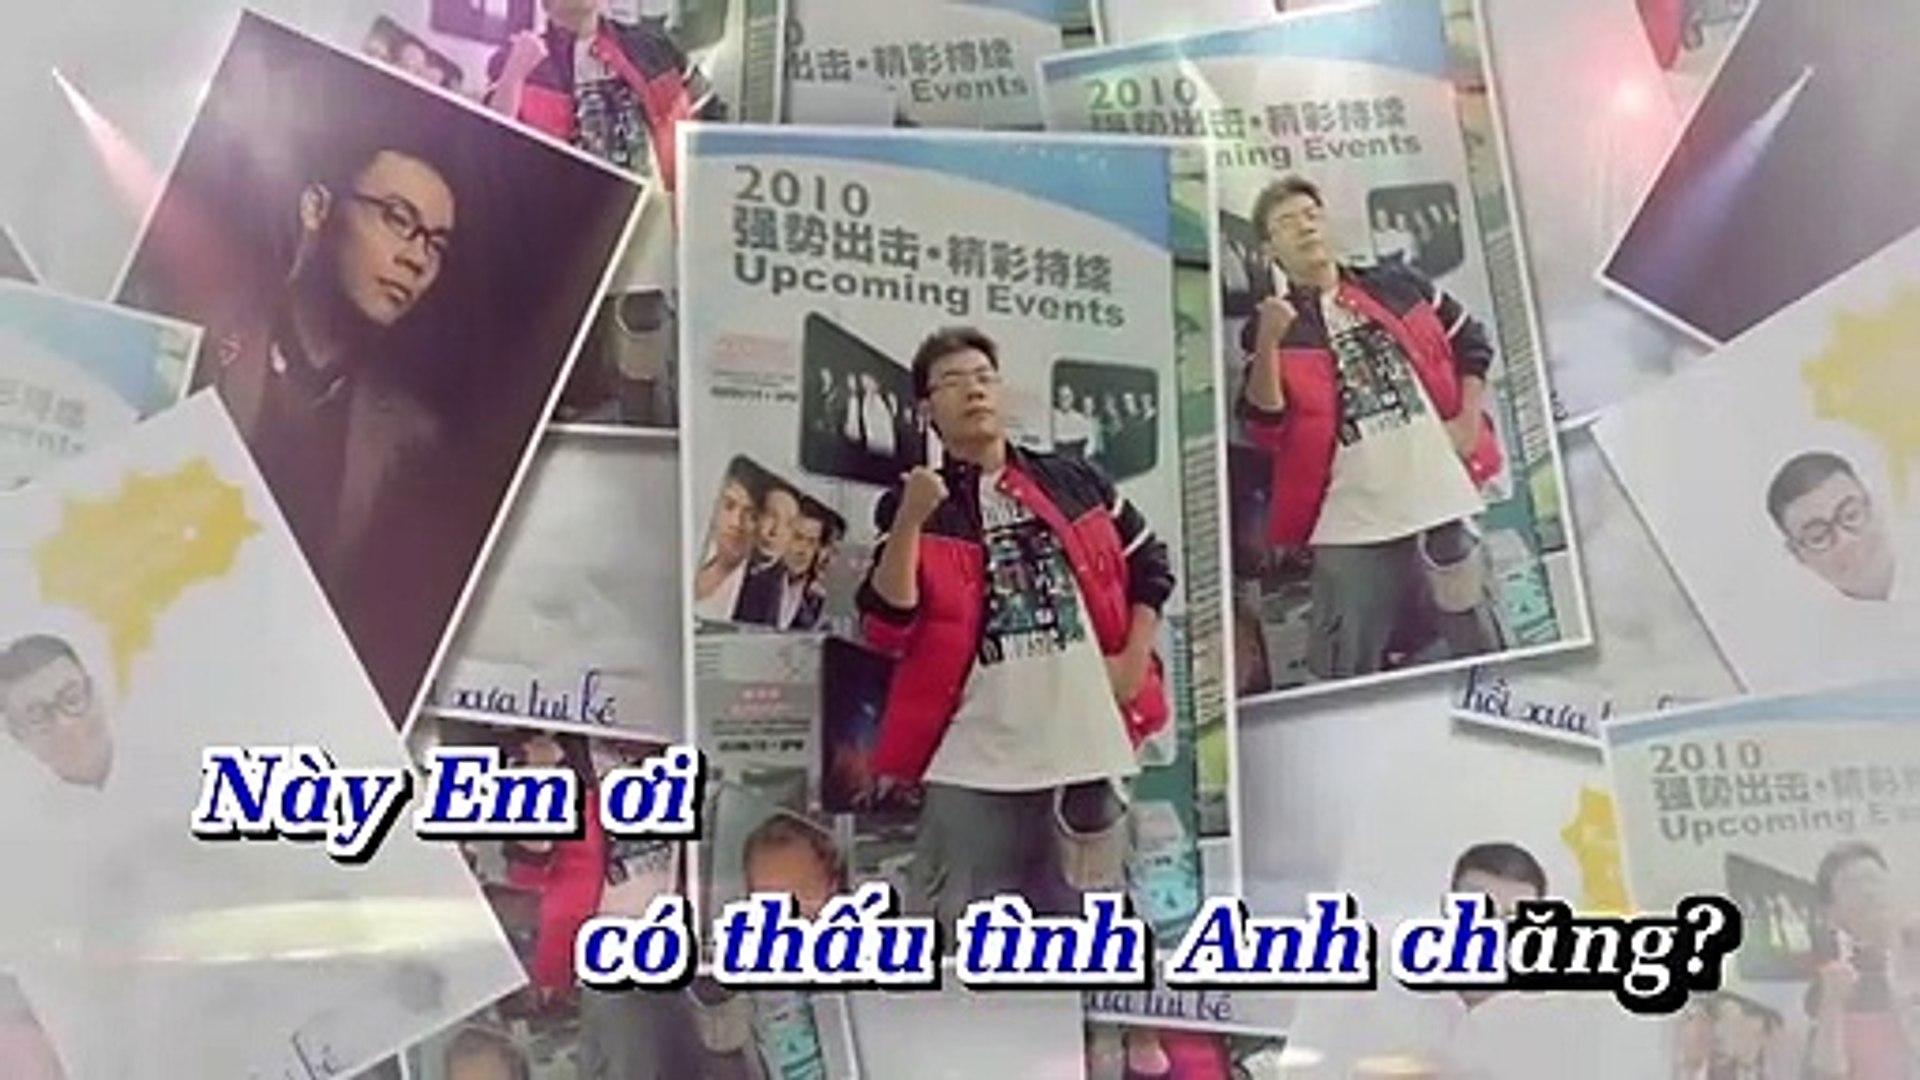 [Karaoke] Phải Duyên Hay Nợ - Hamlet Trương [Beat]